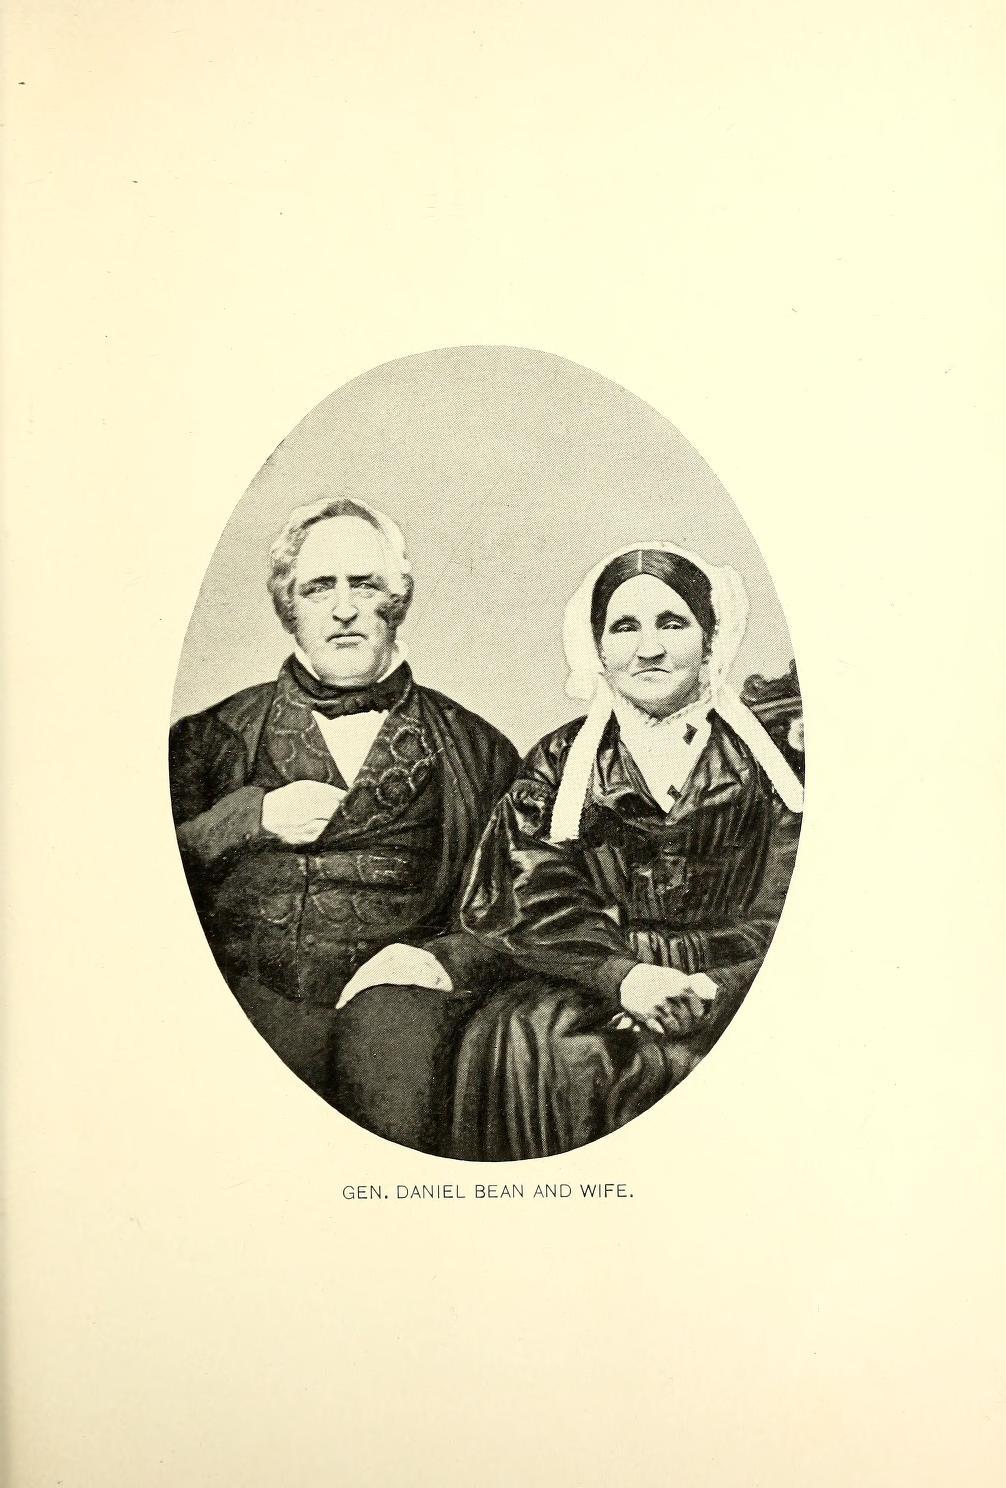 Gen. Daniel Bean and Wife